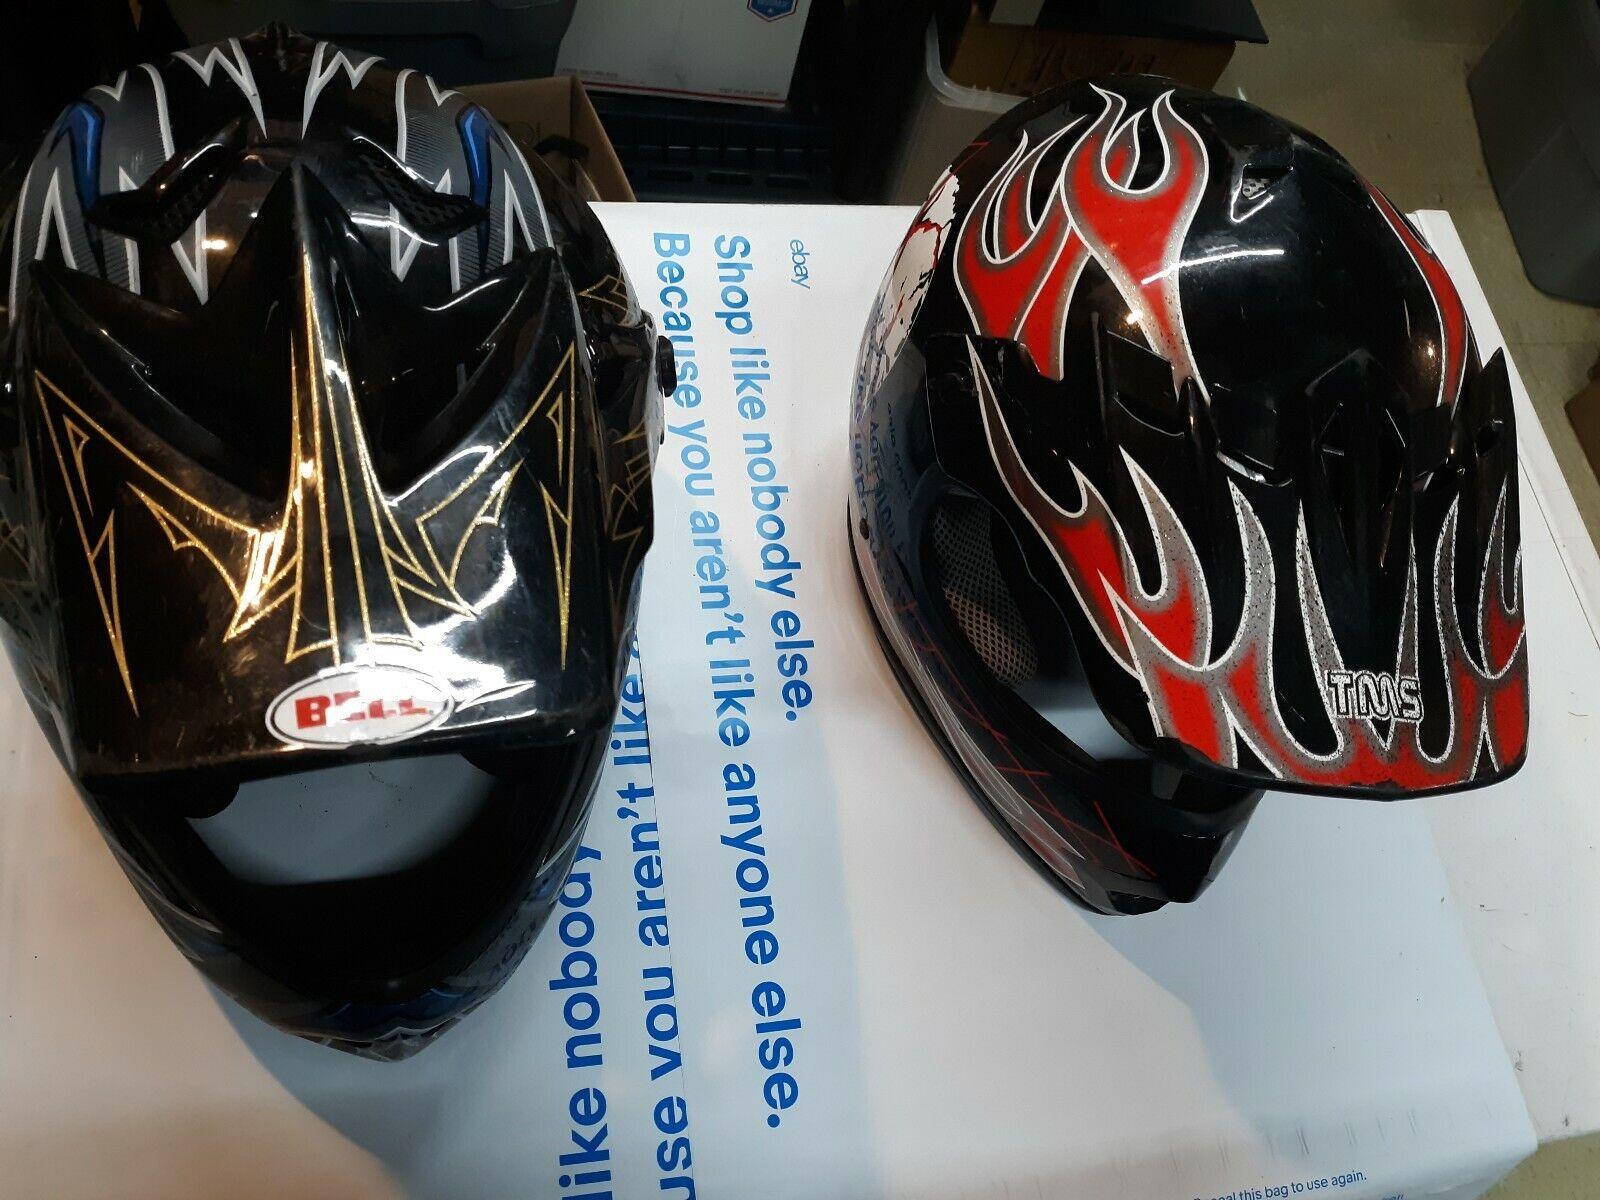 BELL Exodus Thrill Seeker bleu Helmet grand rouge TMS grand Lot of 2 Helmets